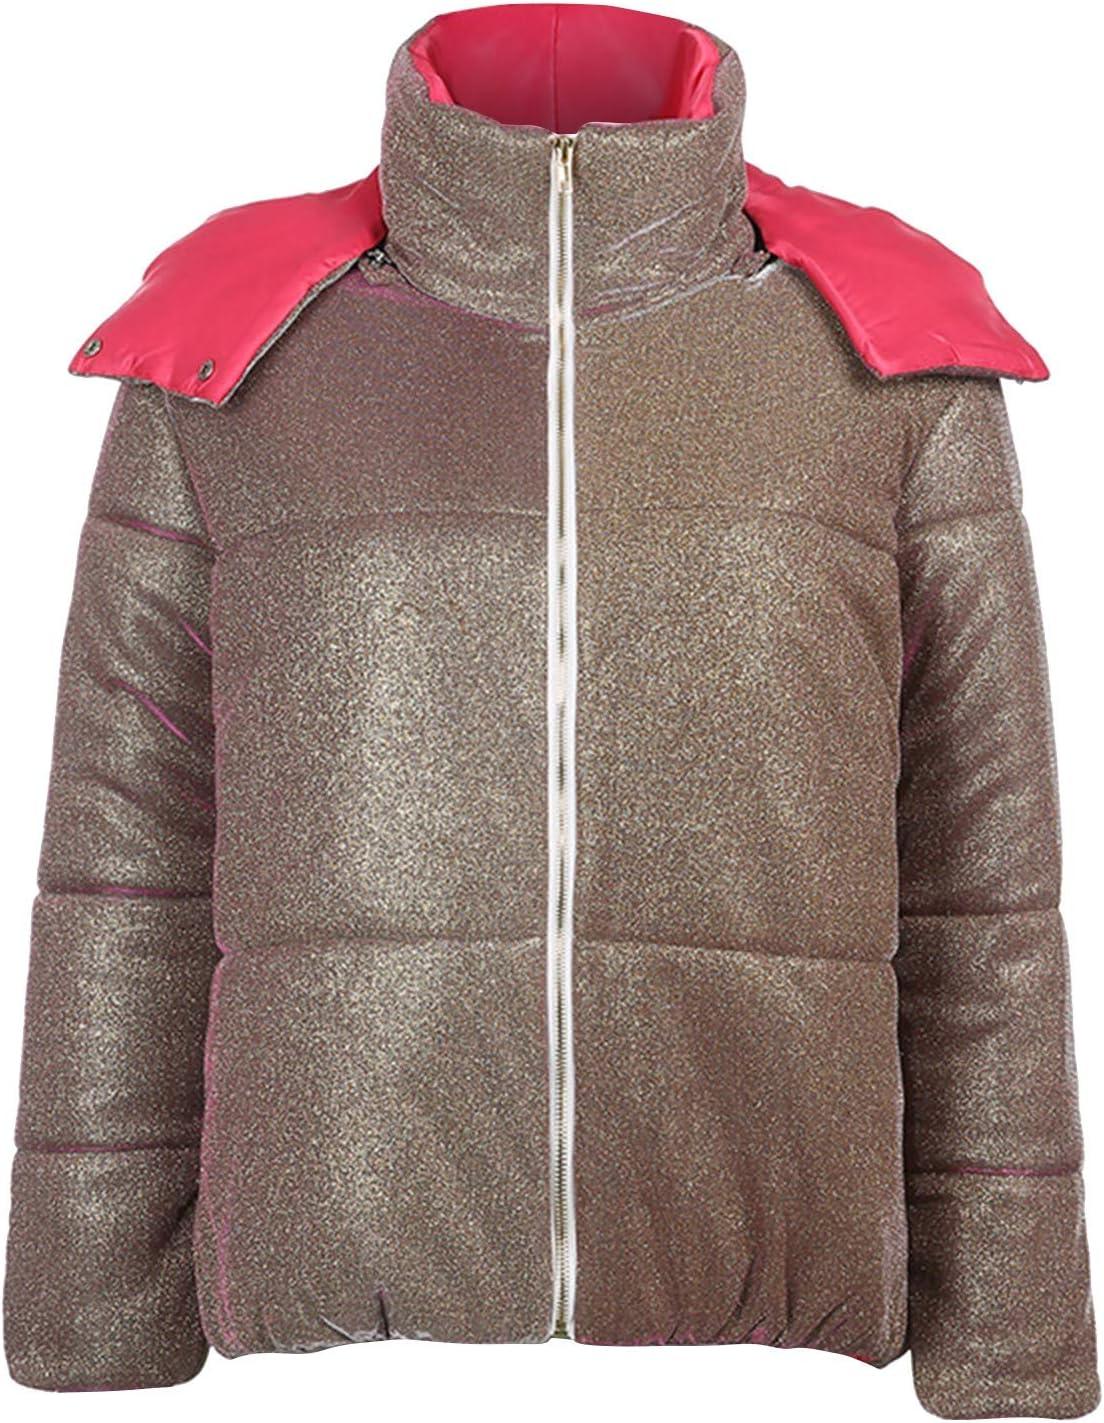 Smileyth Women's San Antonio Mall Short cheap Thickened Coat Zipper and Autumn Winter H